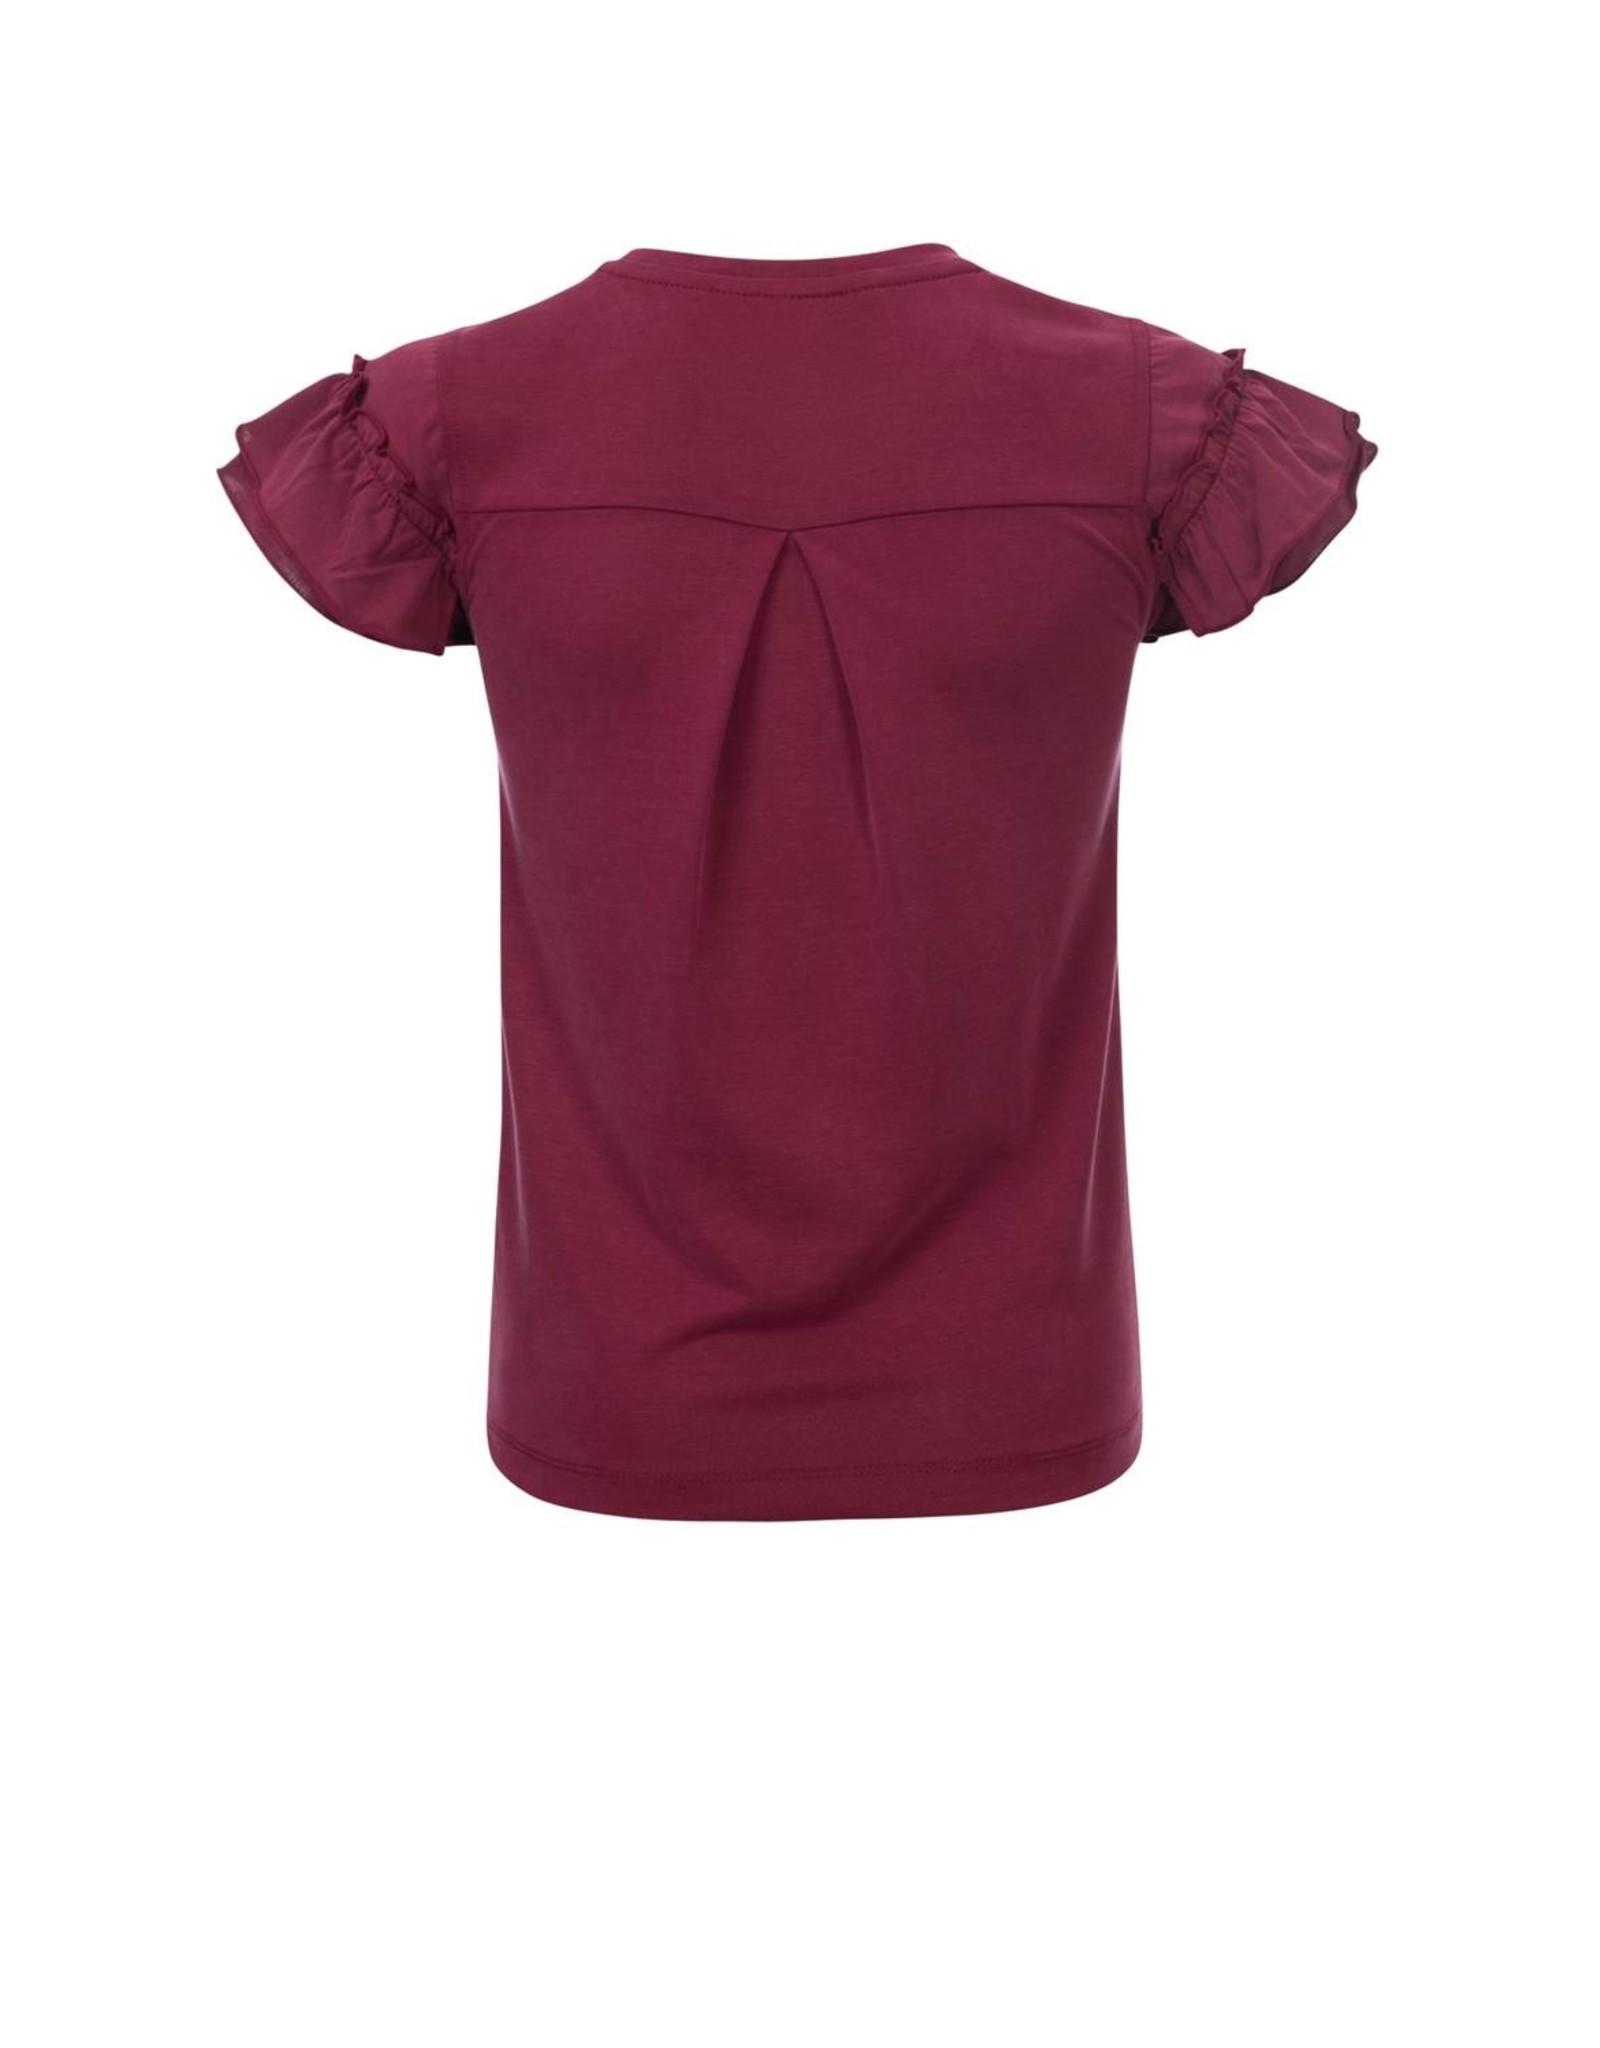 Looxs Girls ruffle sleeve top Ruby